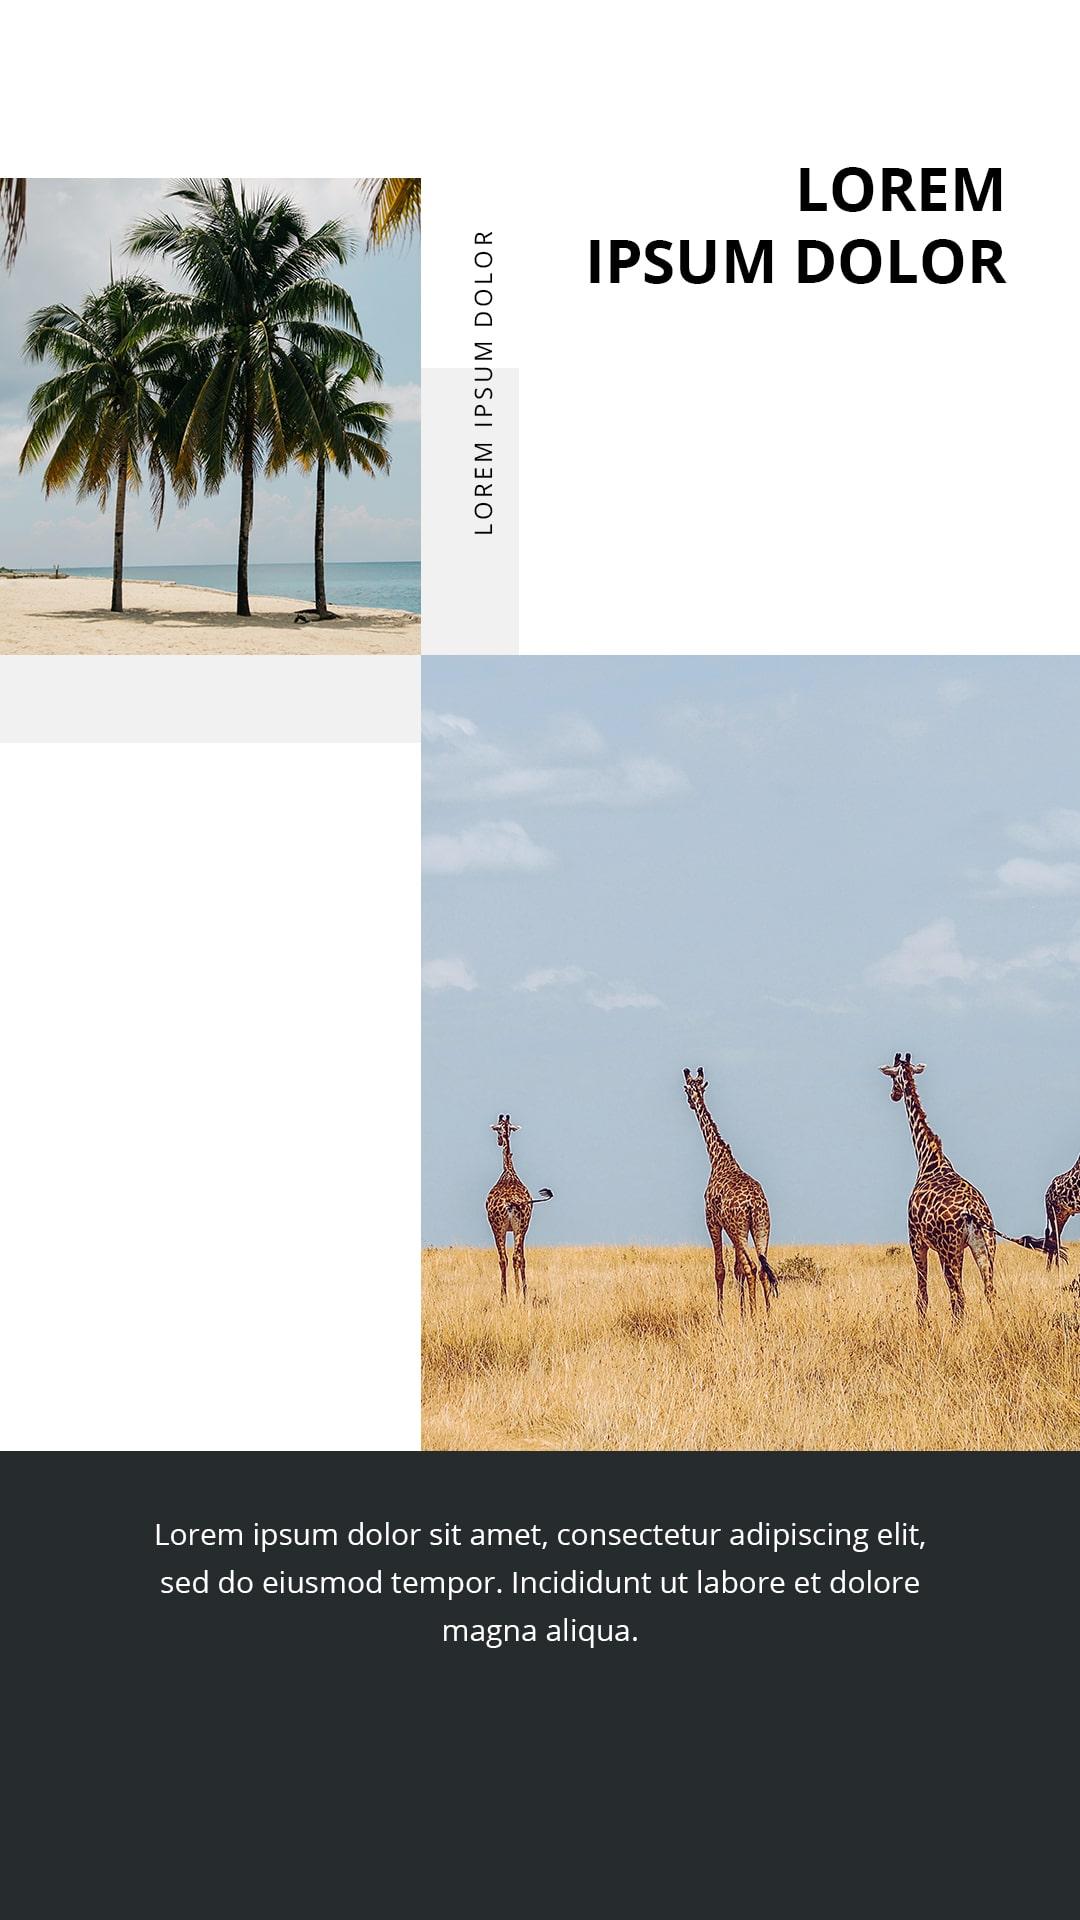 Travel Instagram Templates Bundle: 12 posts, 12 stories + BONUS 14 Instagram Highlight icons - $18 - 3 min 4